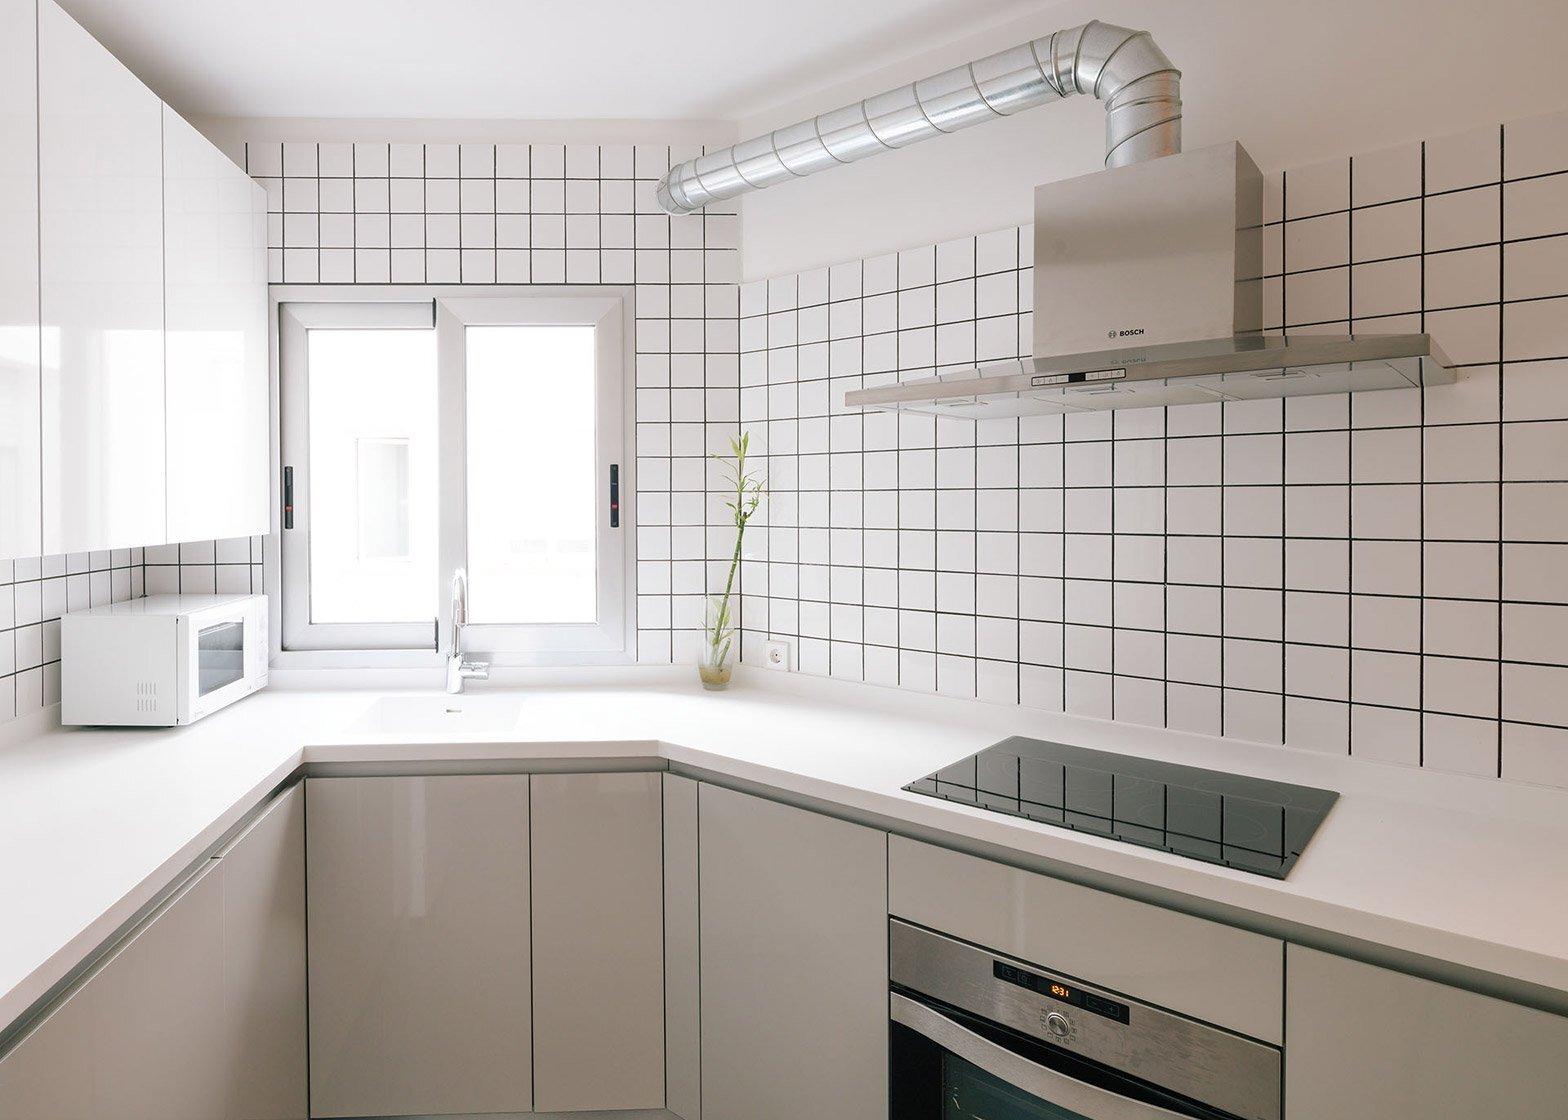 Casa MD - Small Apartment - PYO Arquitectos - Madrid - Kitchen - Humble Homes